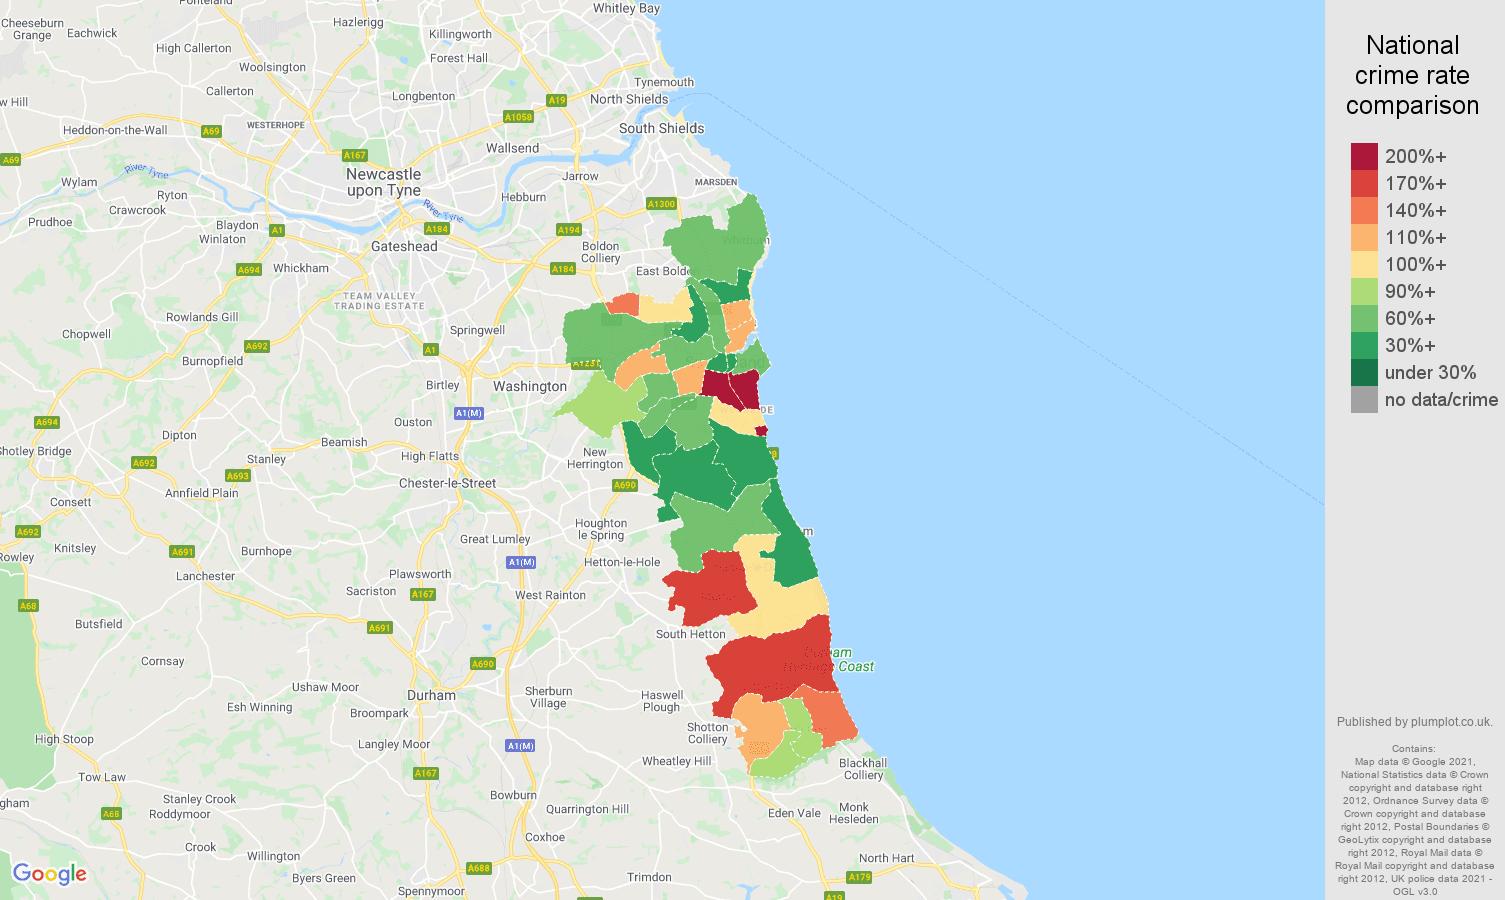 Sunderland vehicle crime rate comparison map